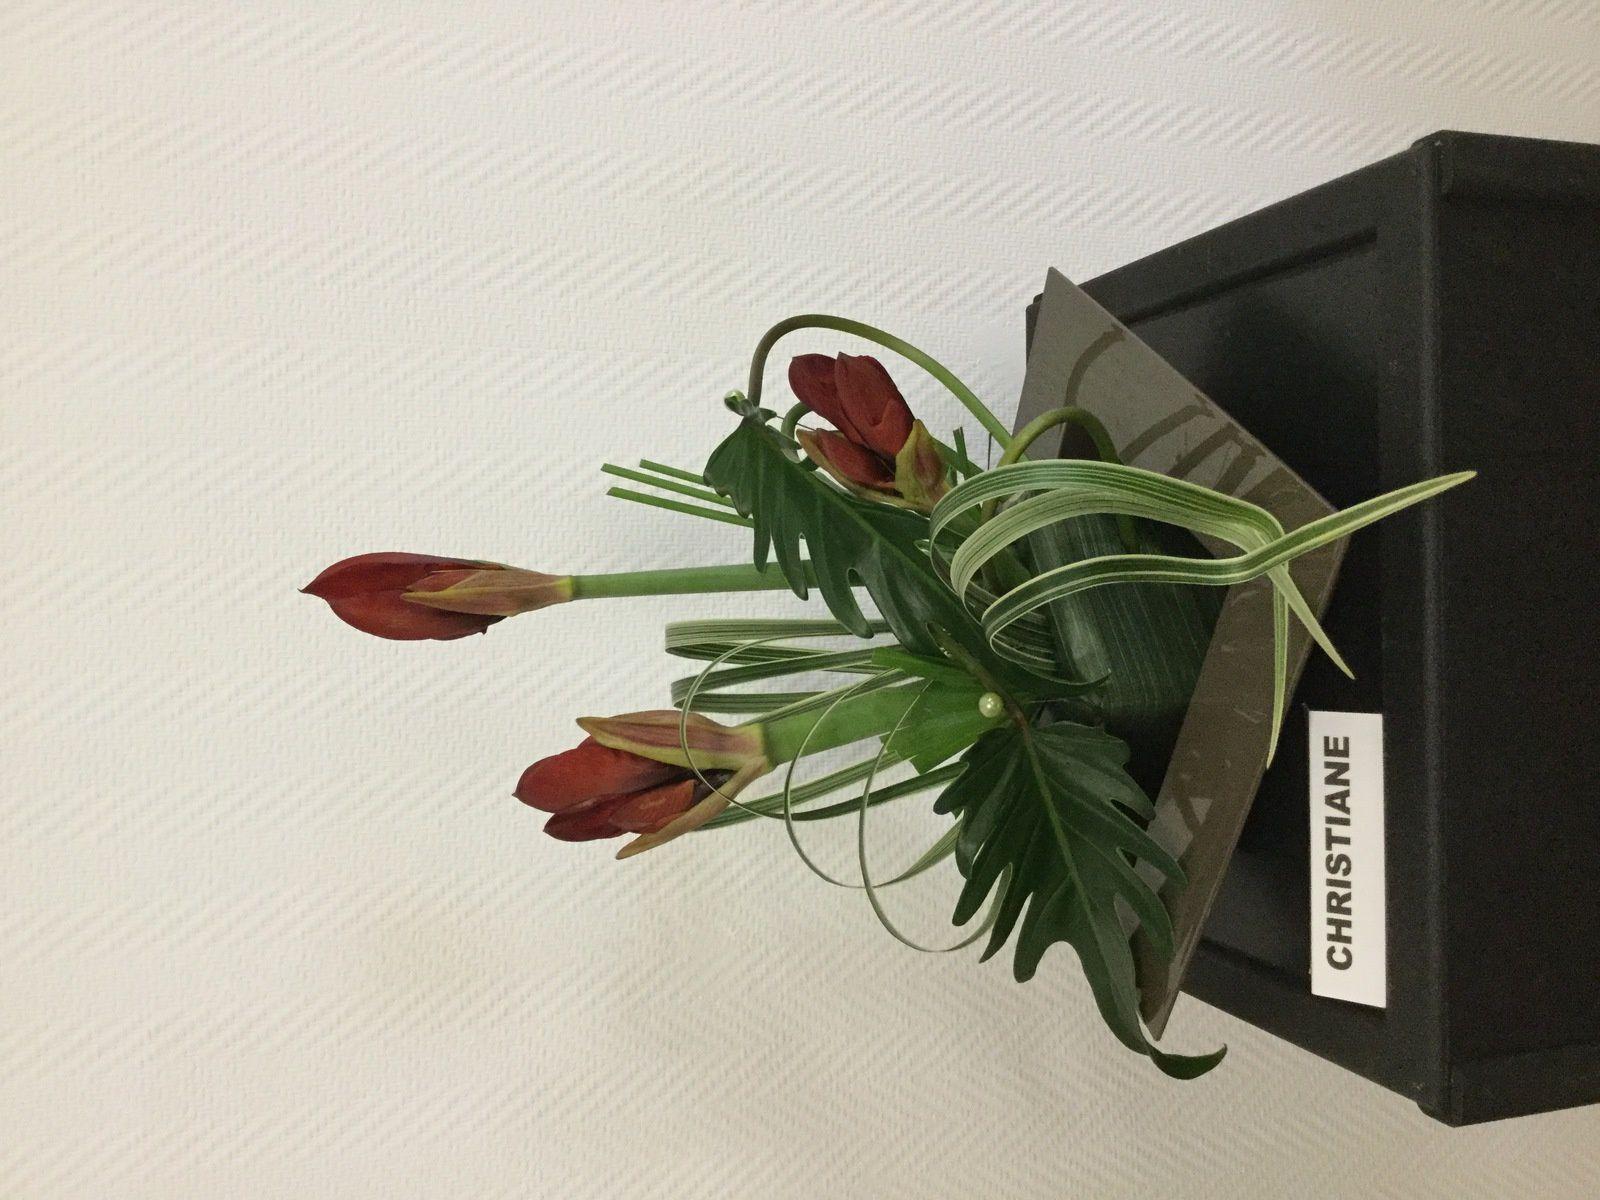 Amaryllis, tee-grass, flexi-grass, Xanadu, pandanus, chamerops, typha